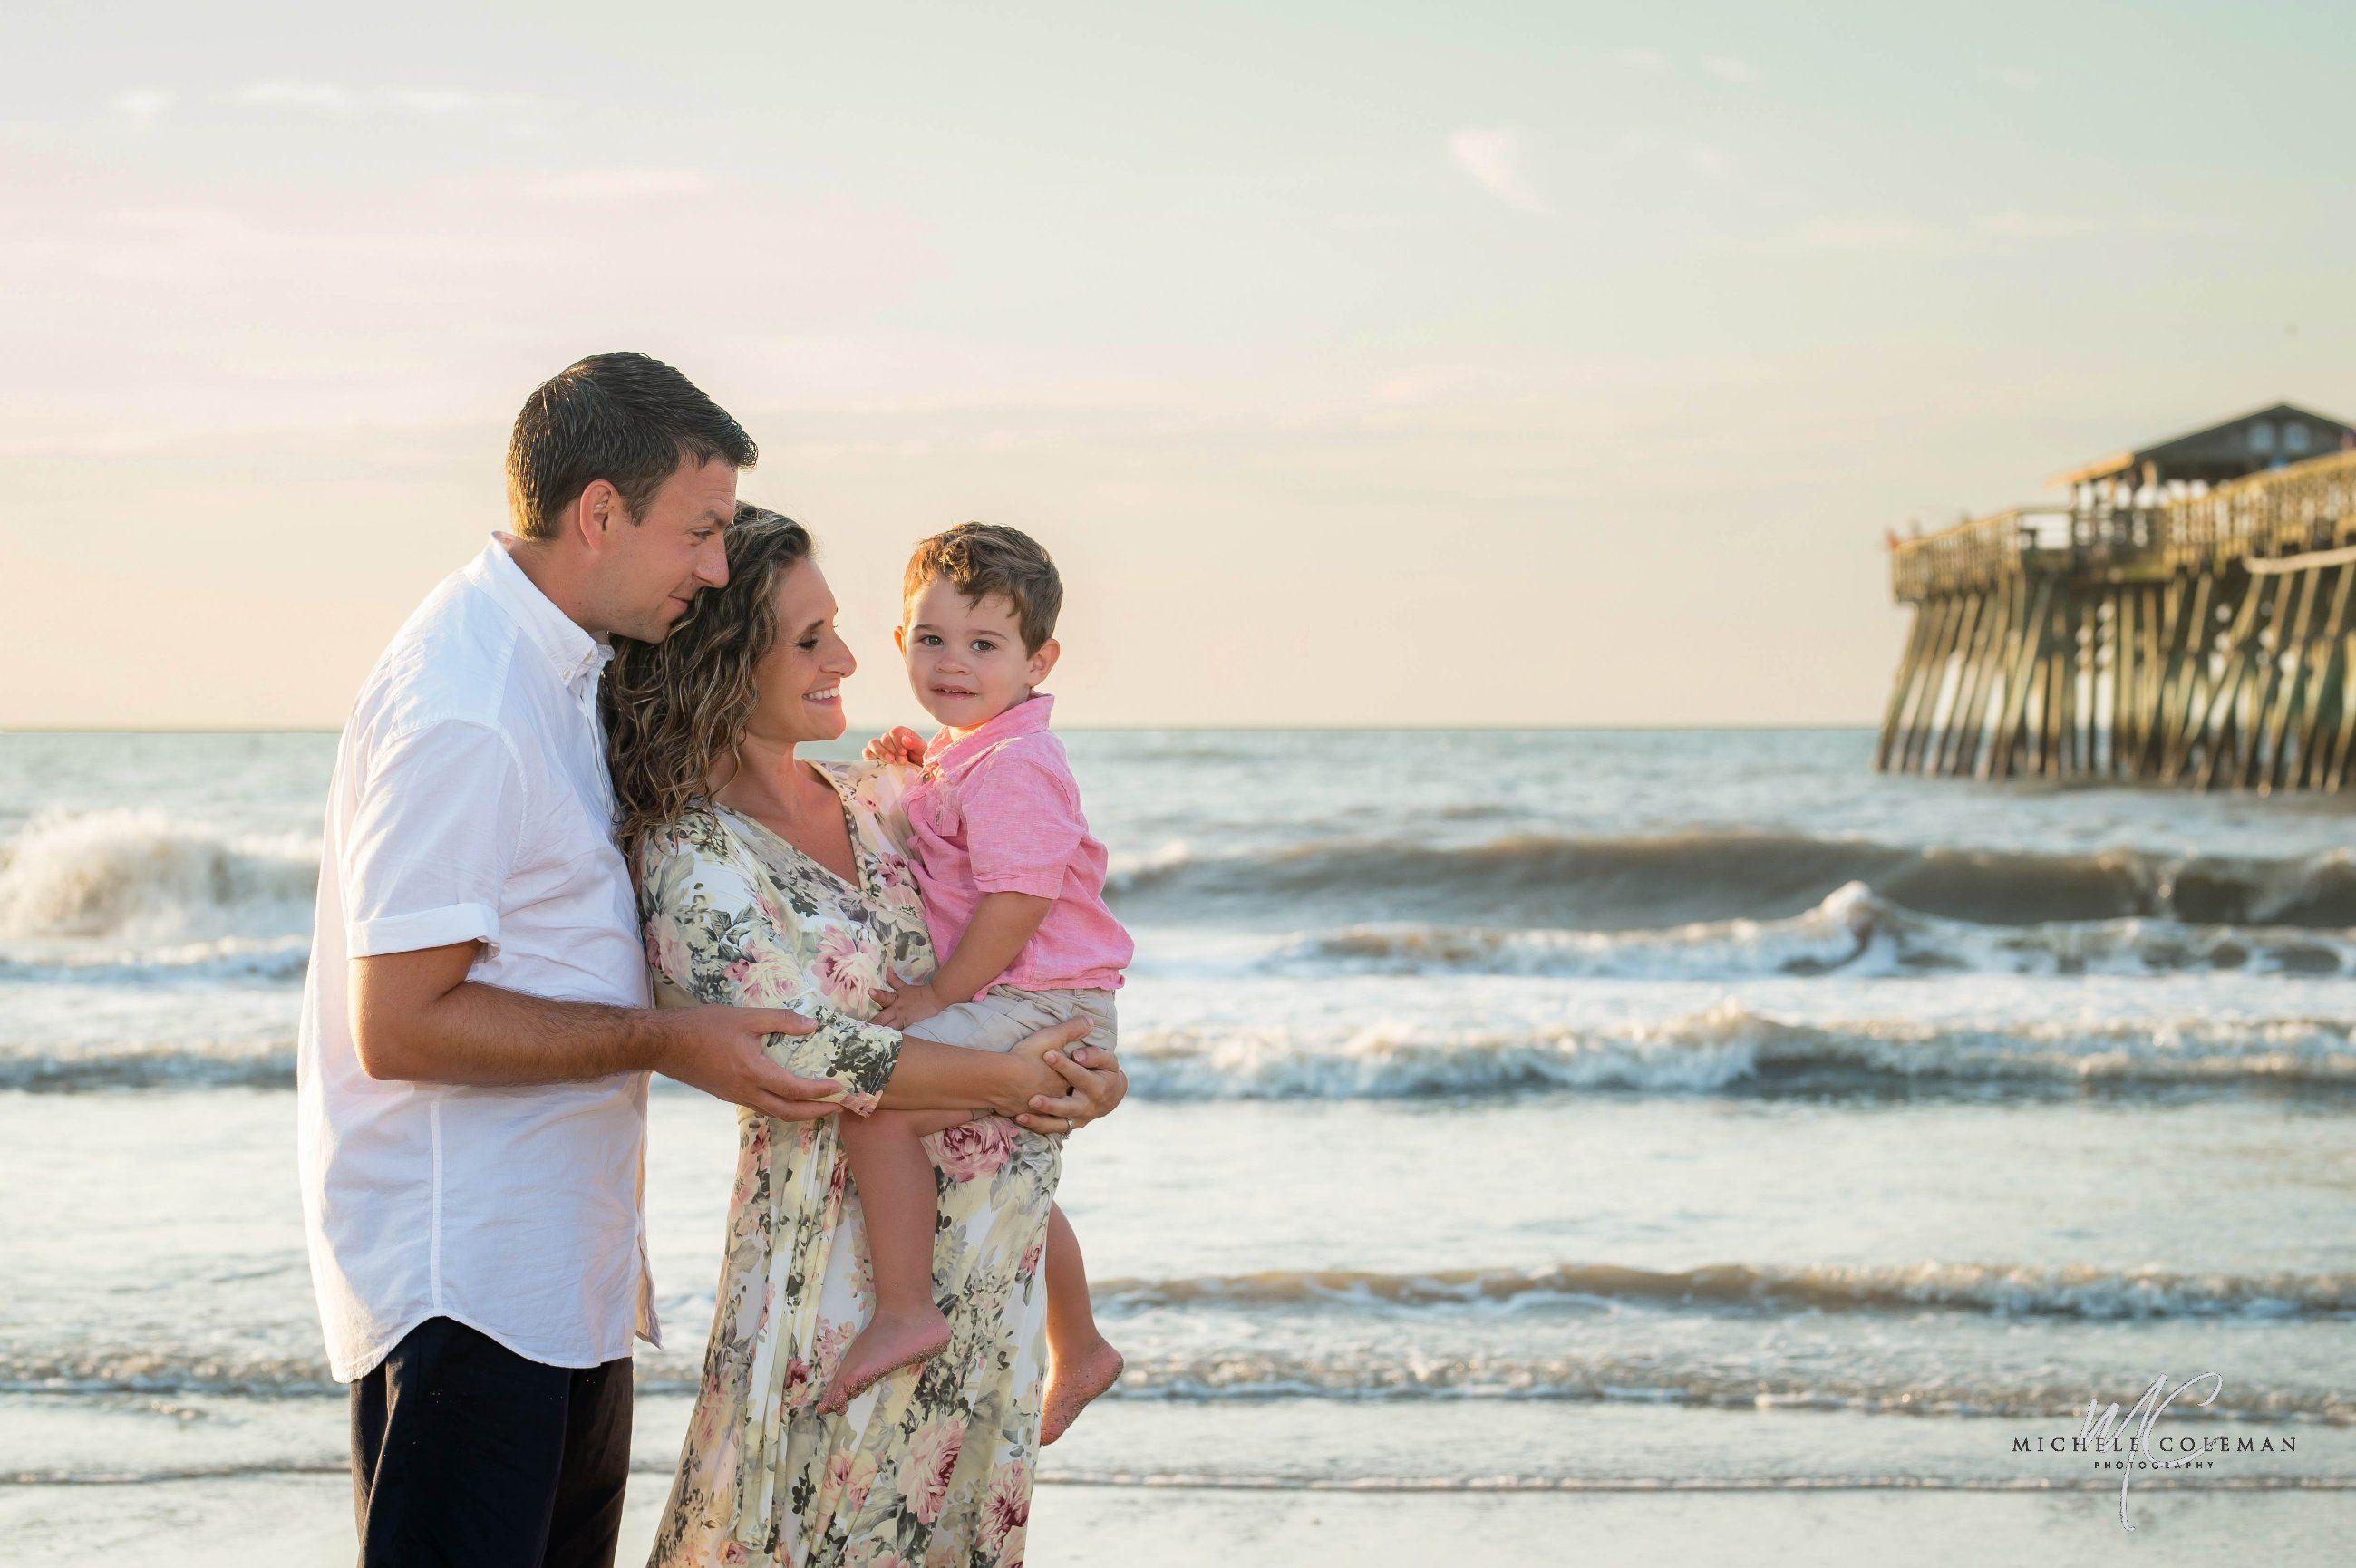 Sunrise Family Portrait near the pier at Myrtle Beach